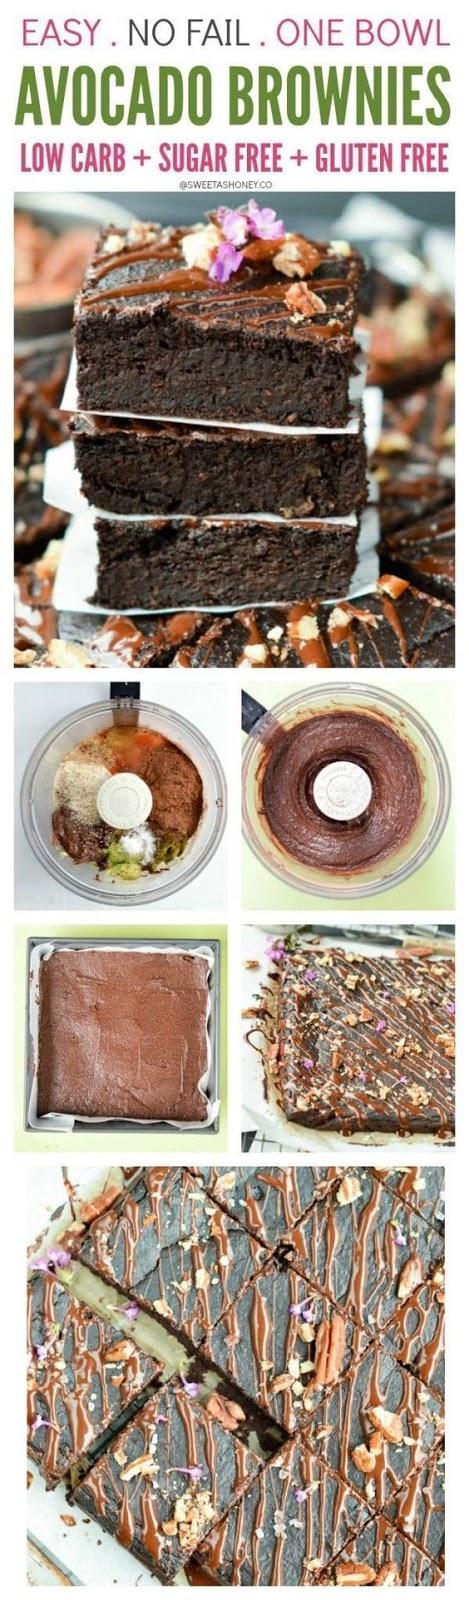 low carb fudgy avocado brownies | sugar free